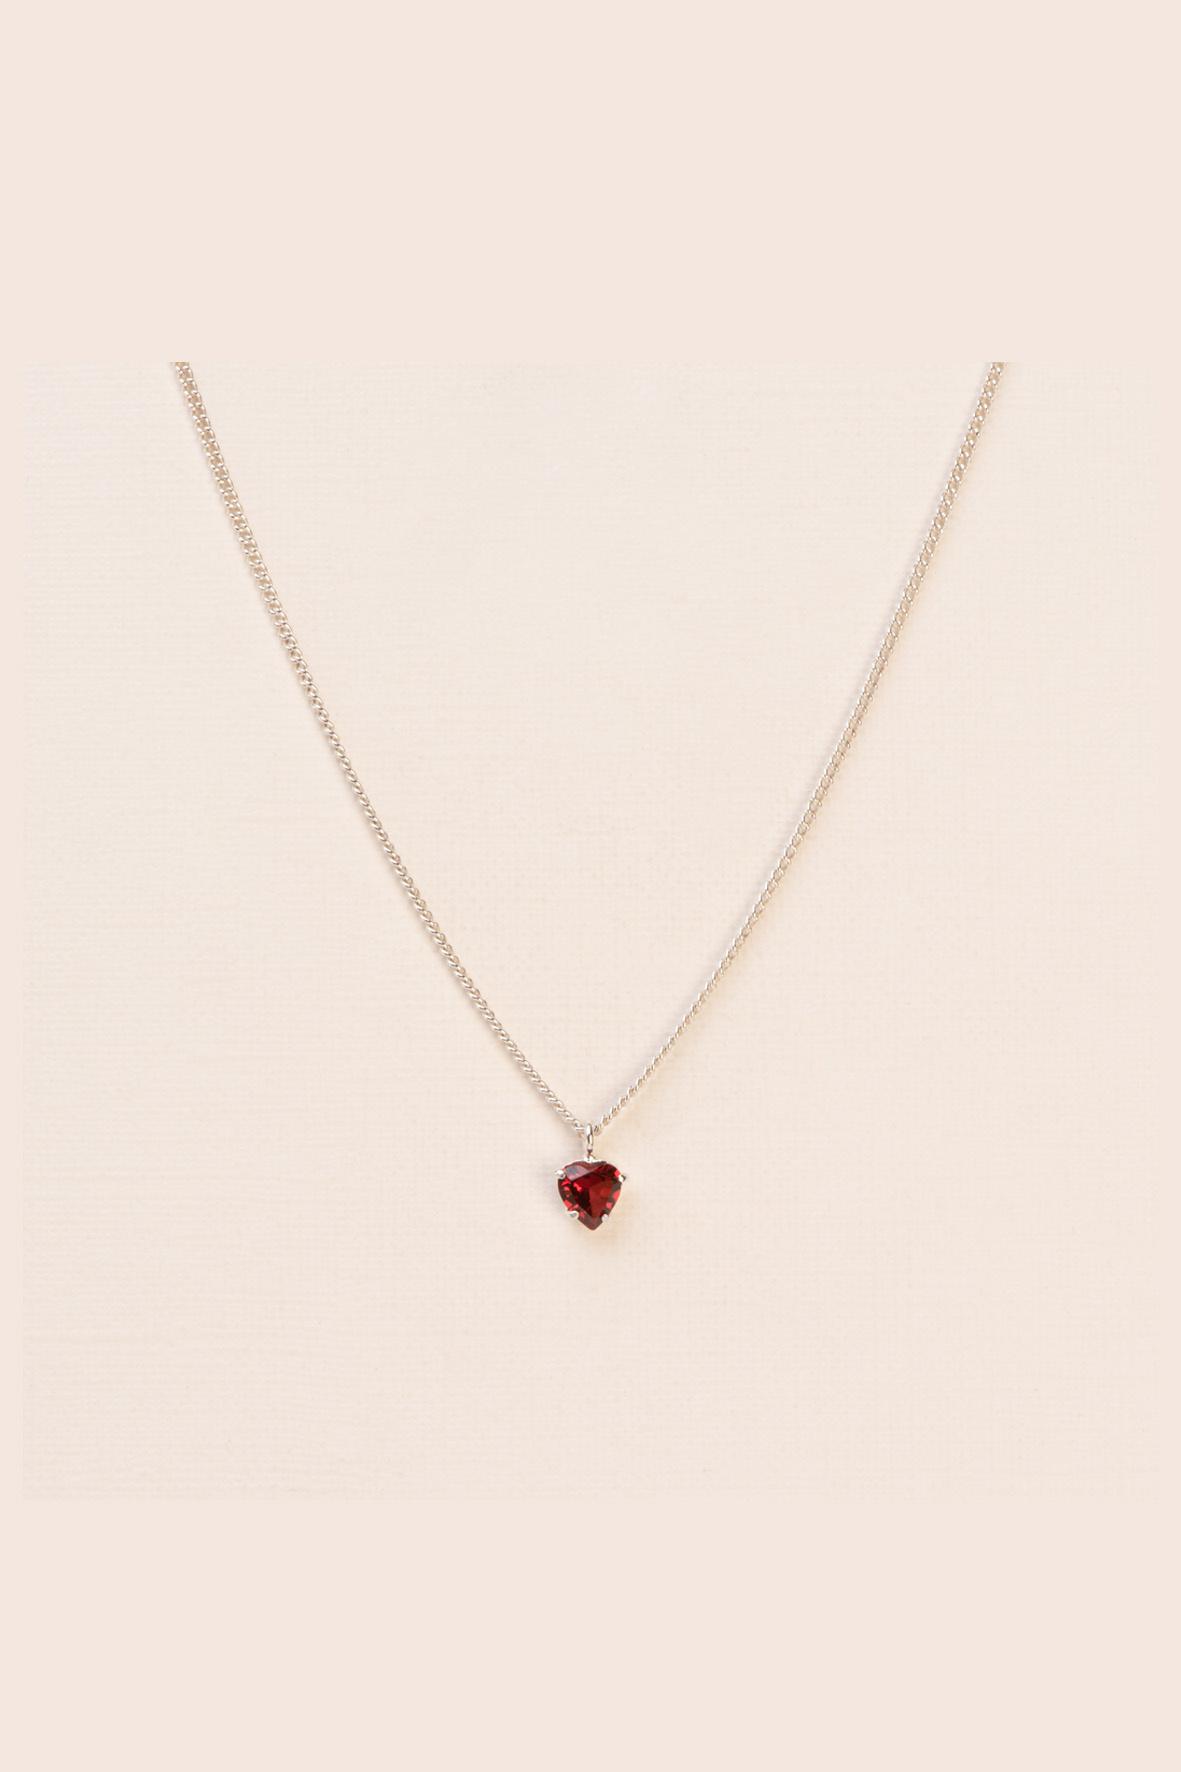 Heart garnet necklace silver